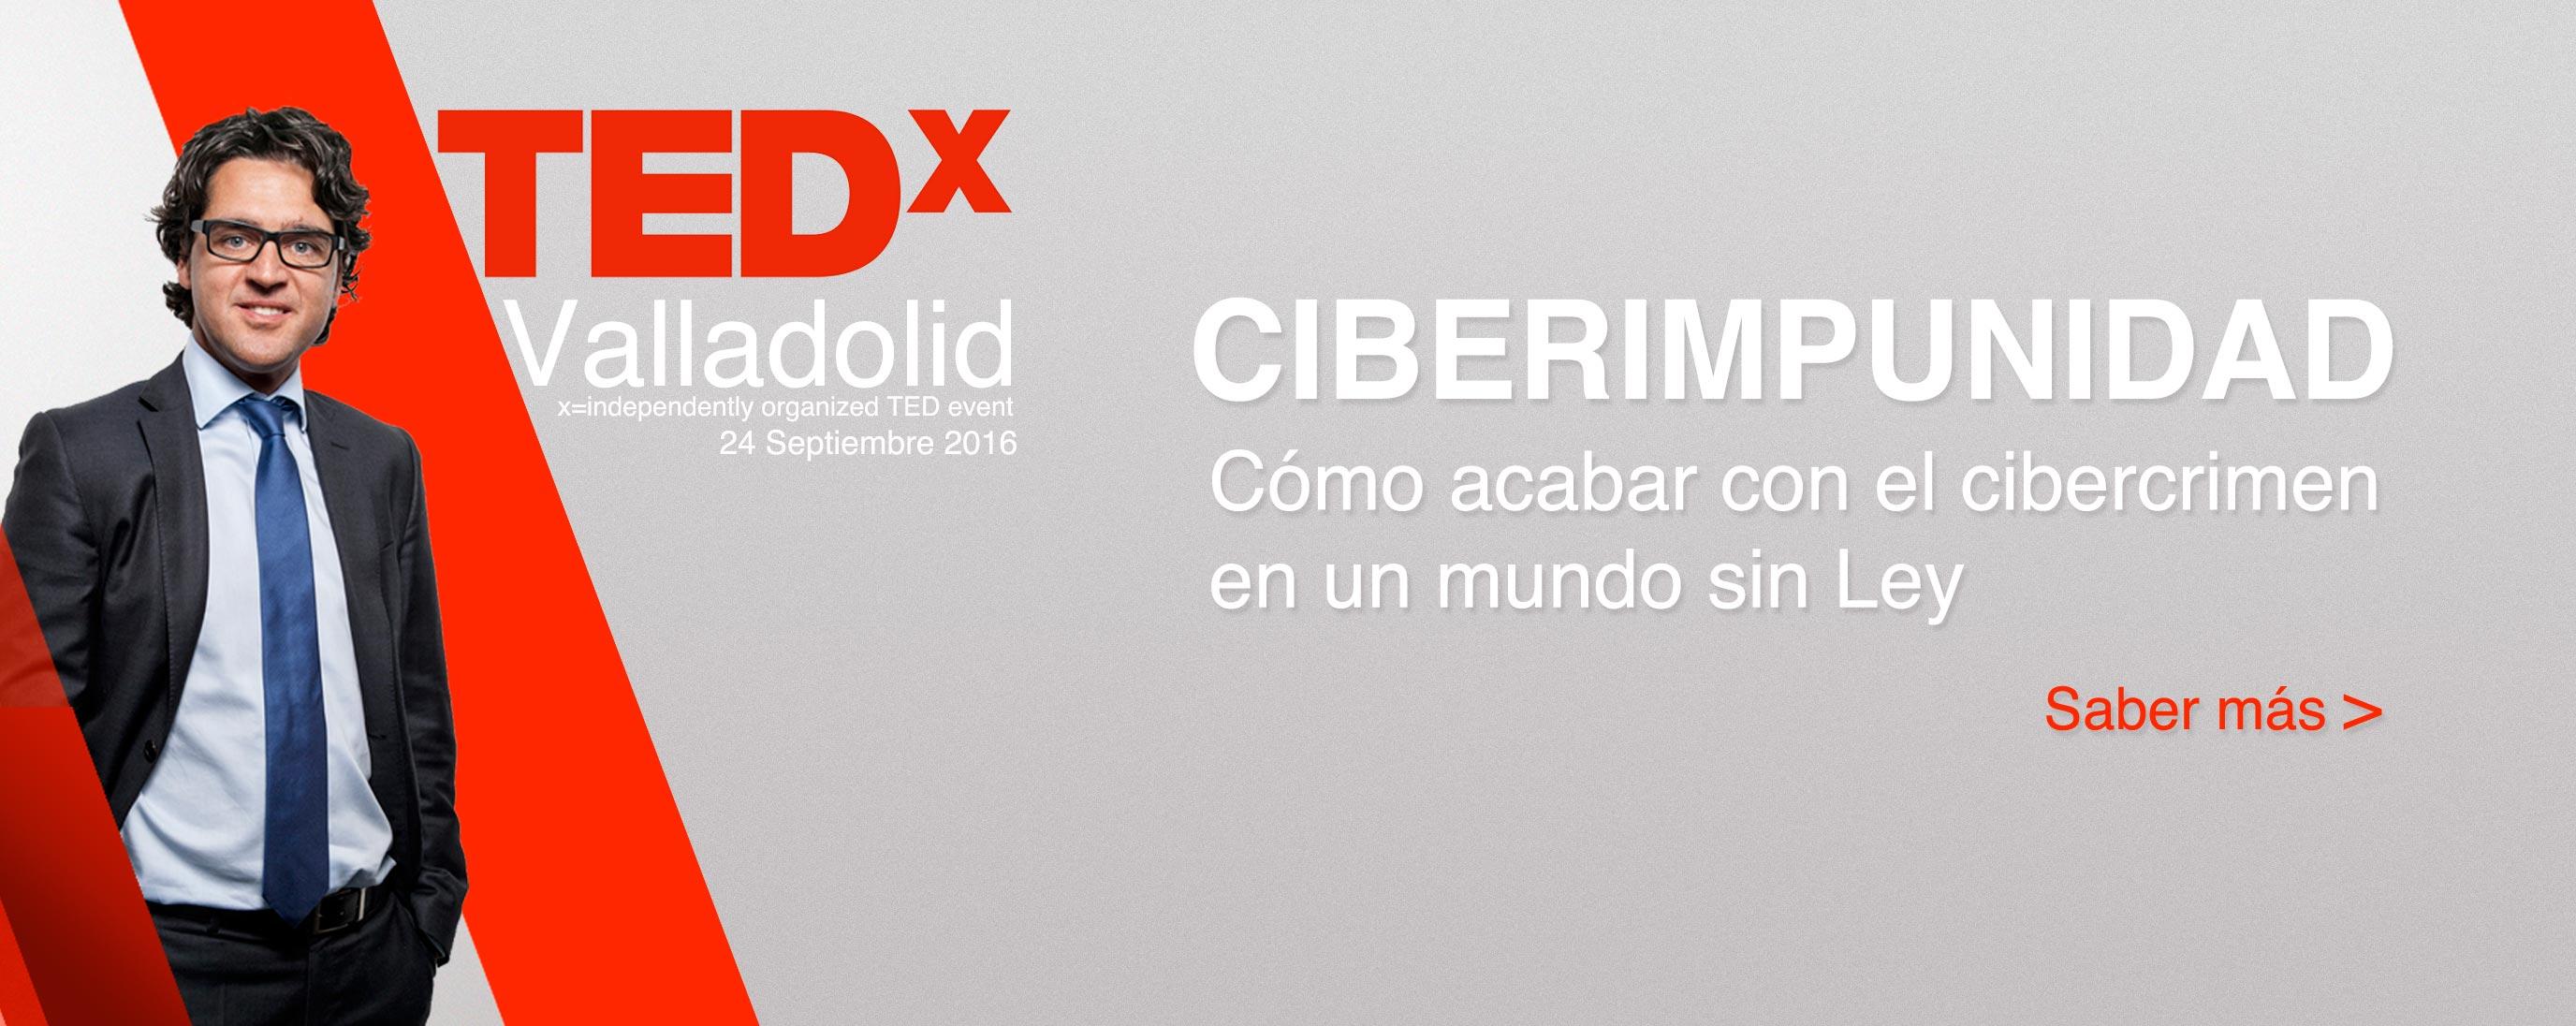 Foto-slider-TEDX_2